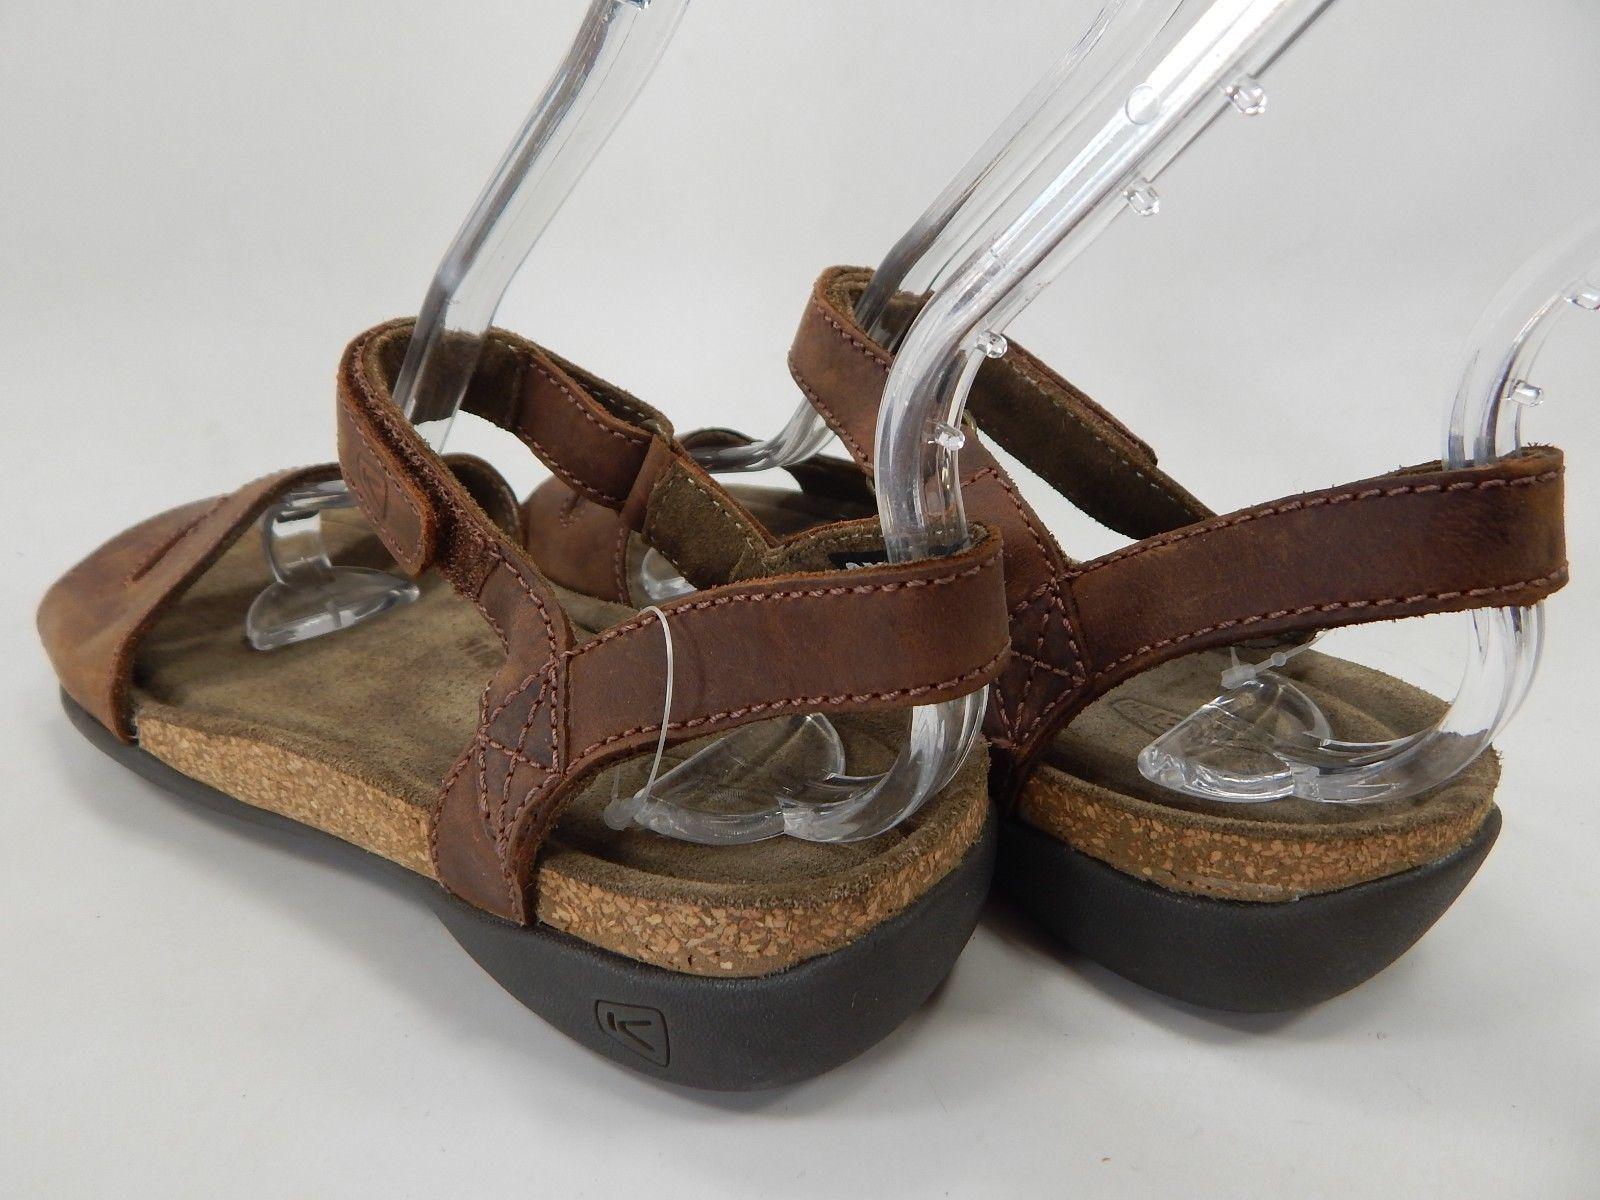 Keen Ana Cortez Size US 7 M EU 37.5 Women's Sports Sandals Brisk / Espresso